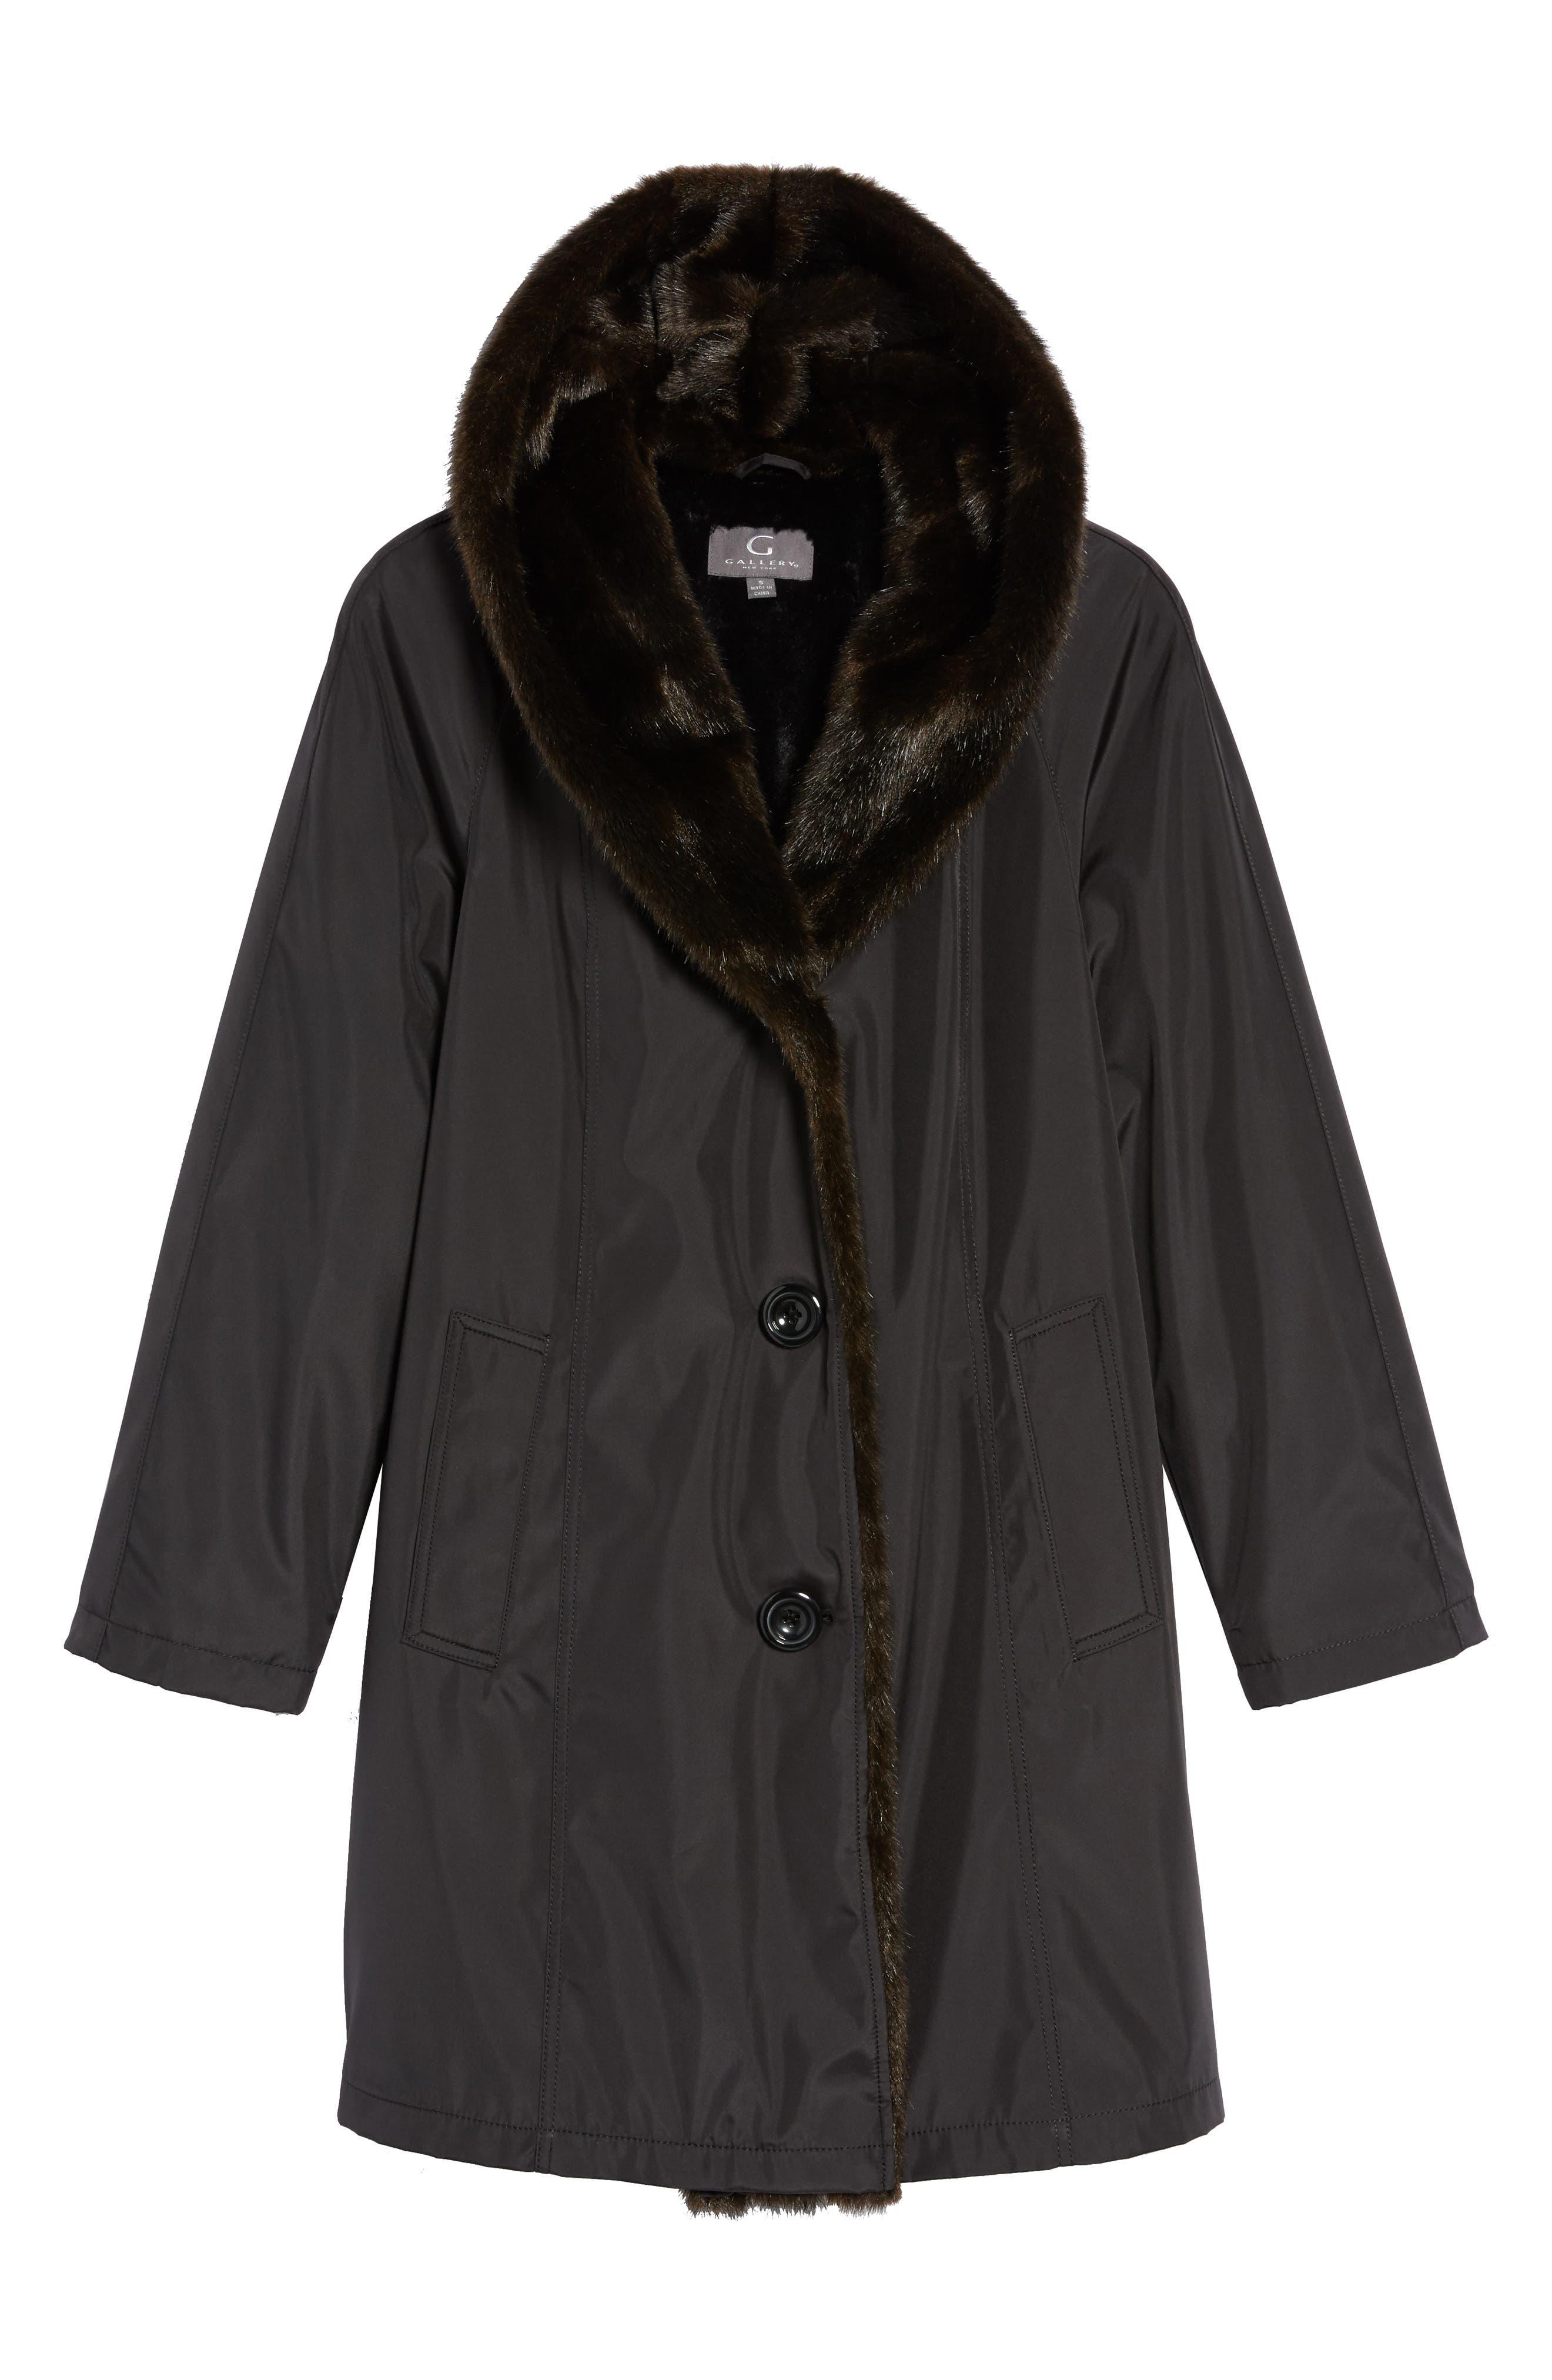 Storm Coat with Faux Fur Trim & Lining,                             Alternate thumbnail 5, color,                             001